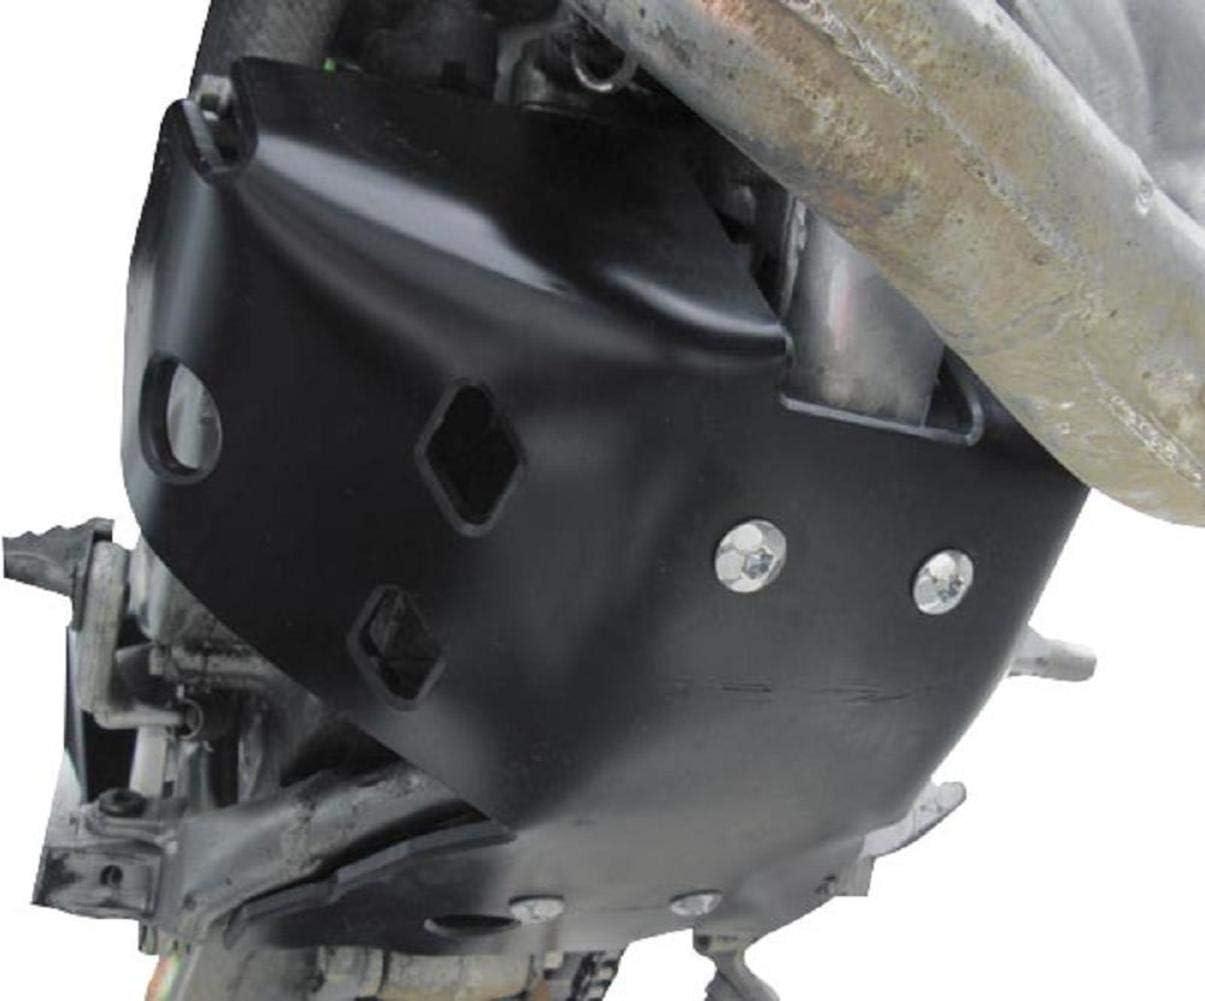 T.M. Designworks Skid Finally resale start 1 year warranty Plate KTMC-251-BK - Black